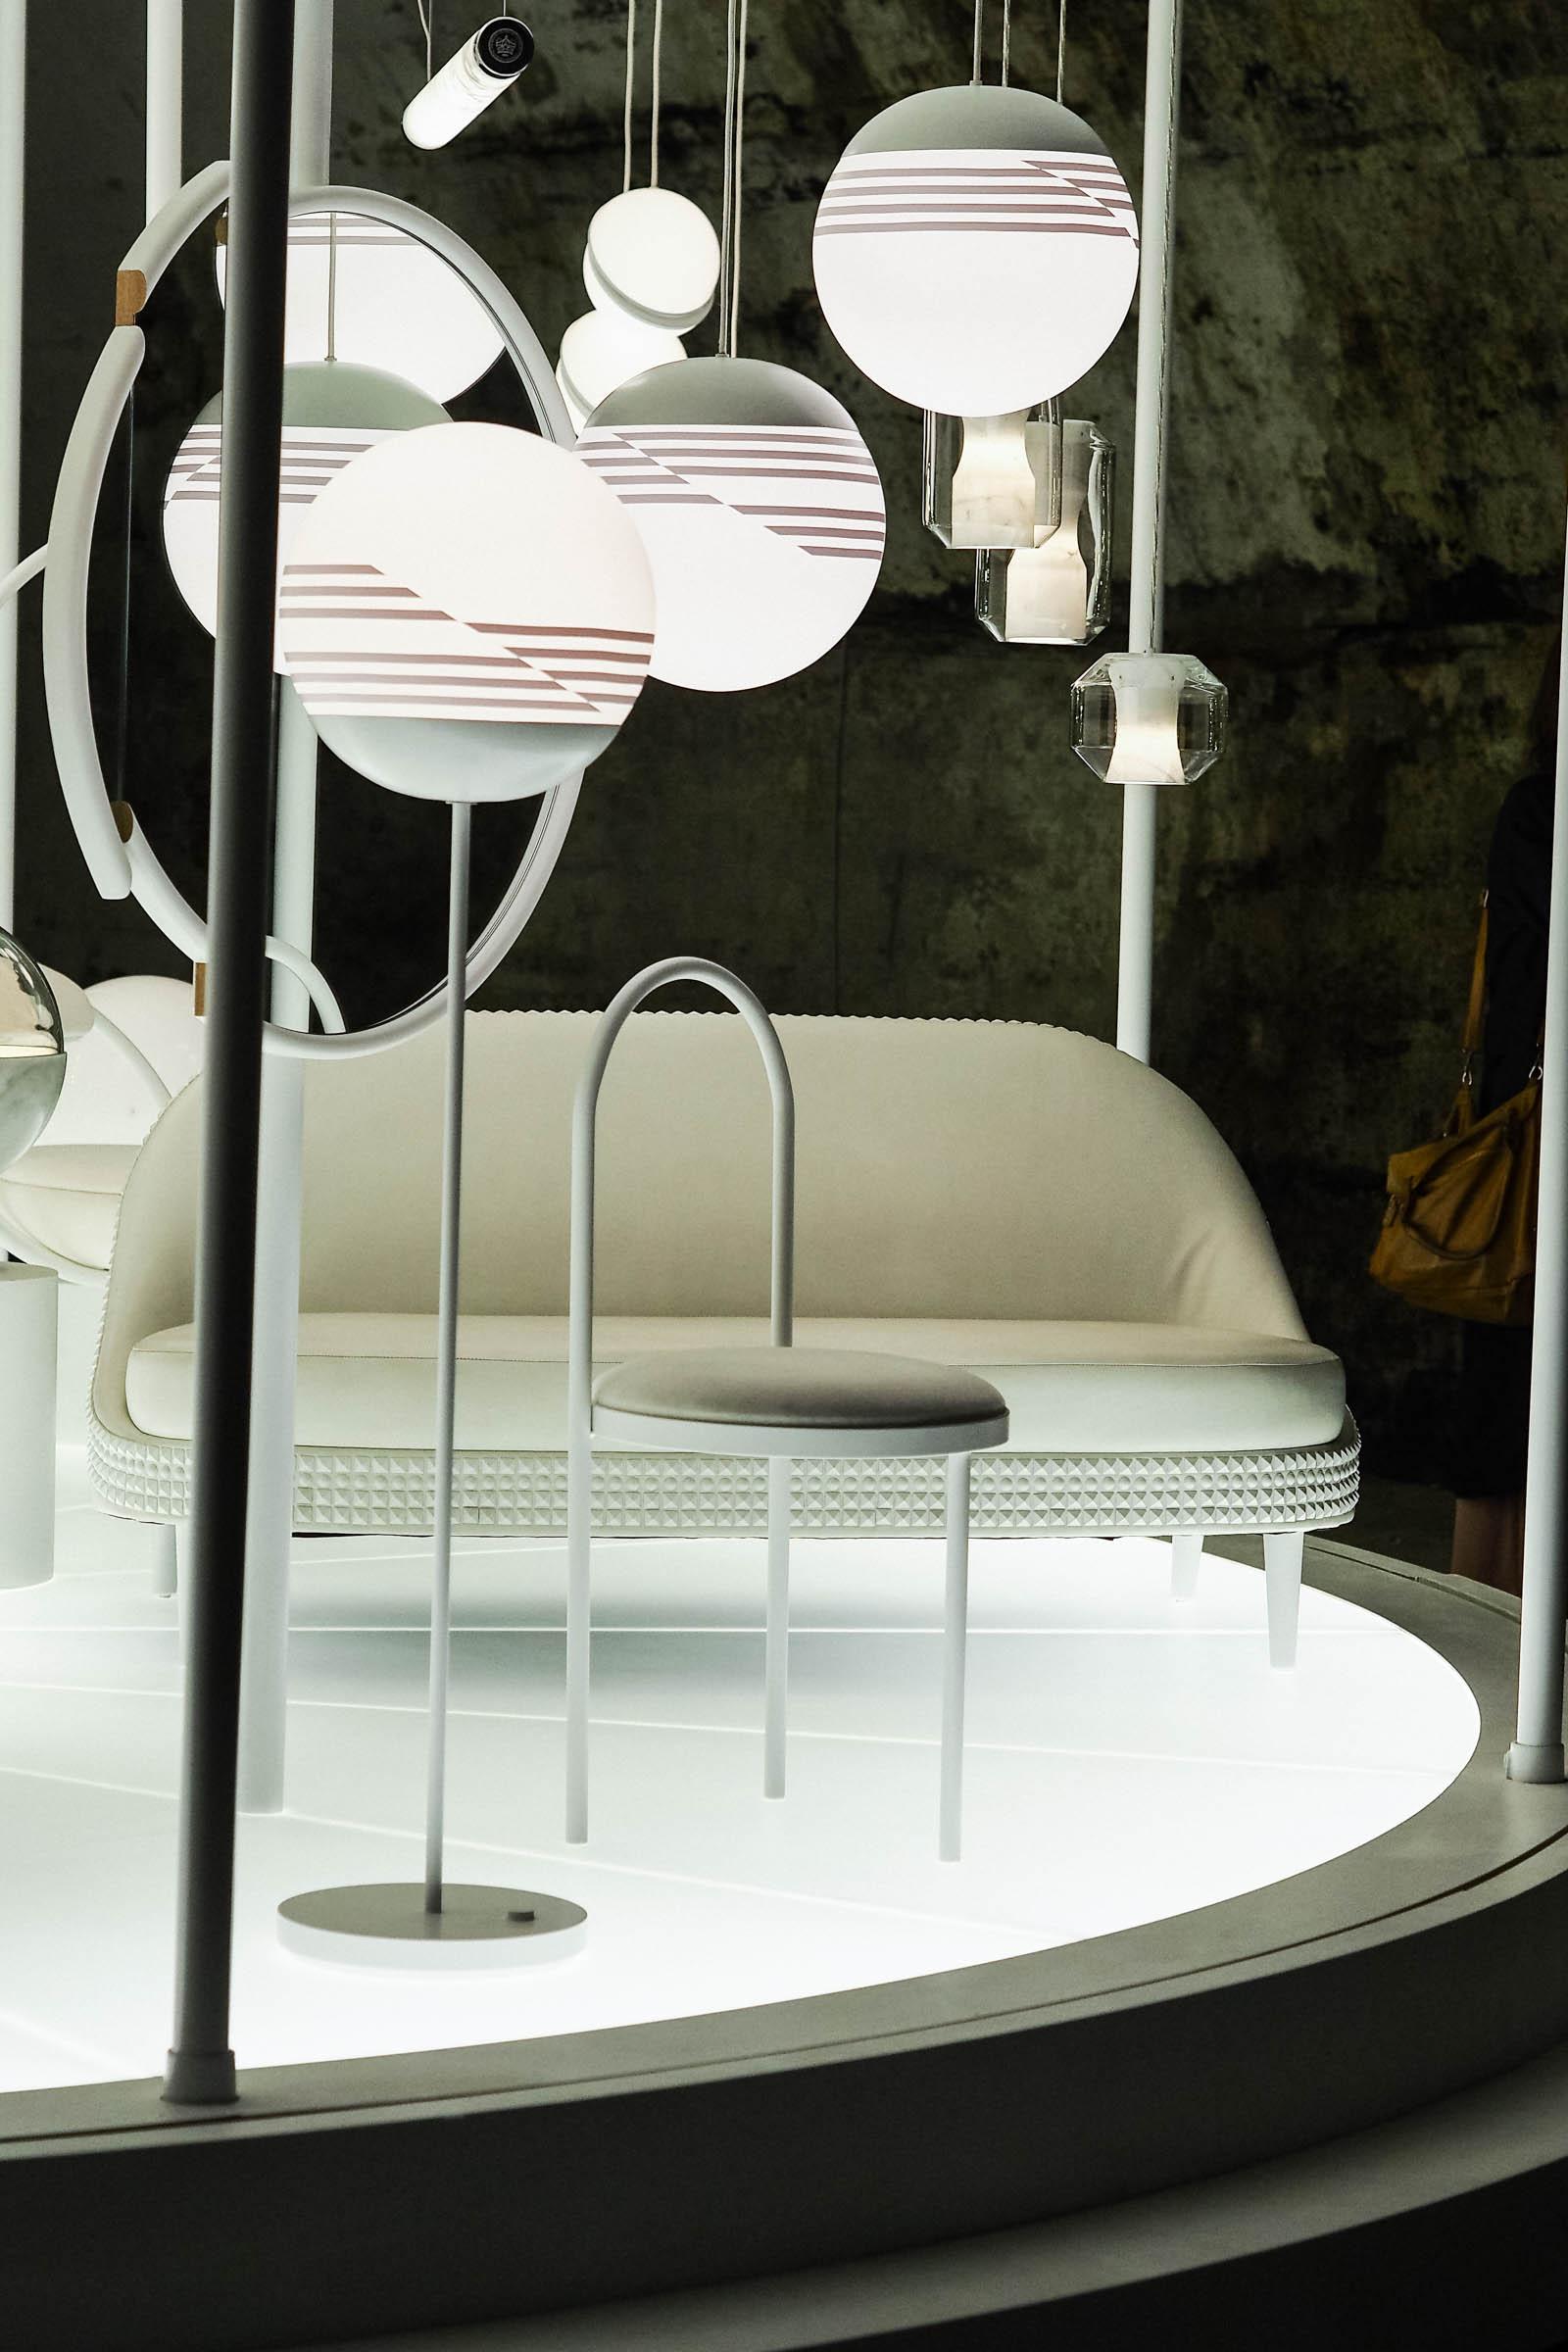 A look at Lee Broom's installation at Milan Design Week 2017.